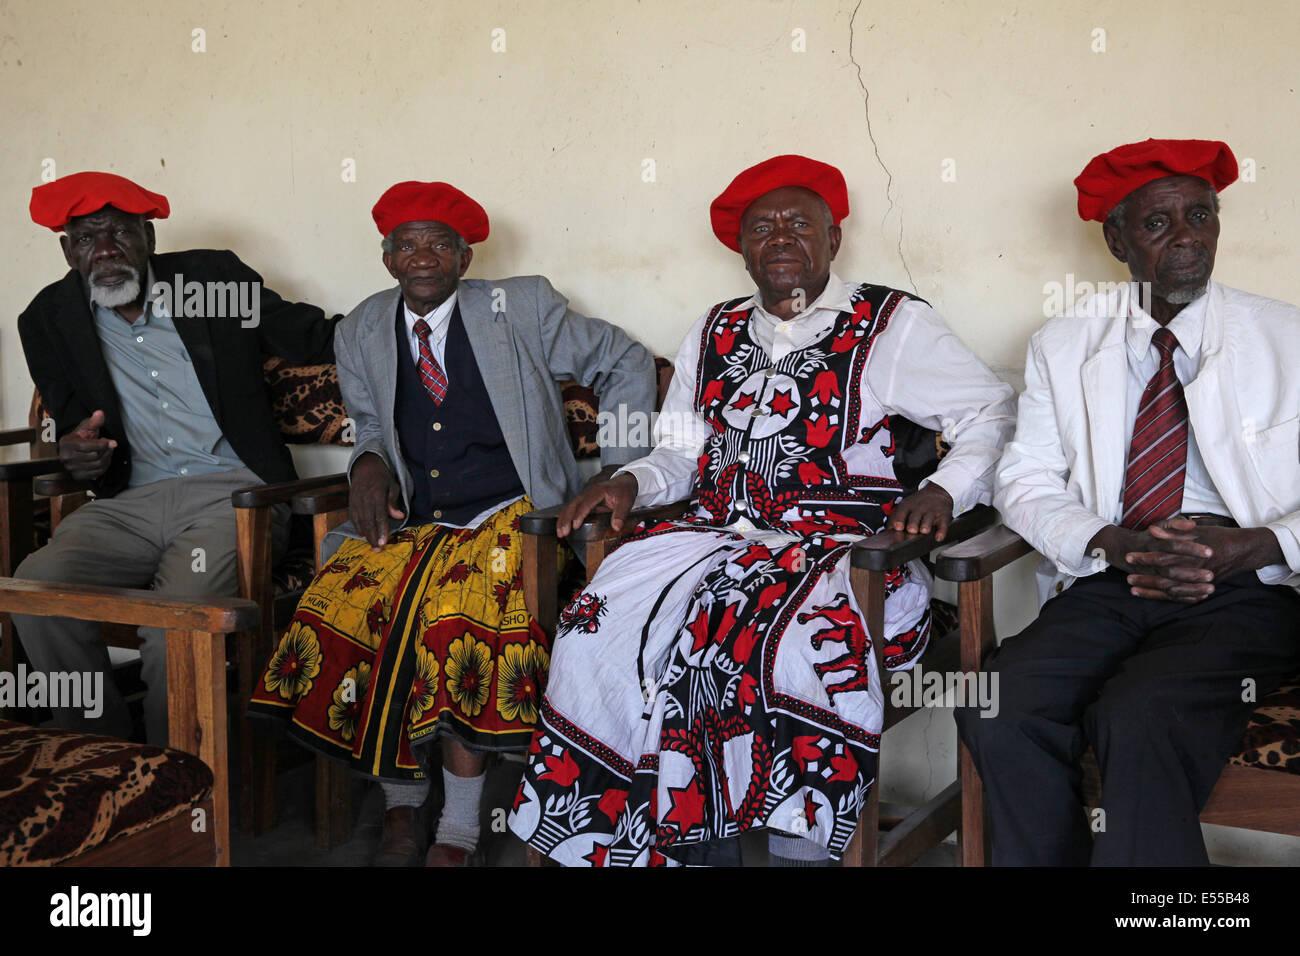 Members of the Kuta, the Lozi parliament in Barotse land, Zambia - Stock Image